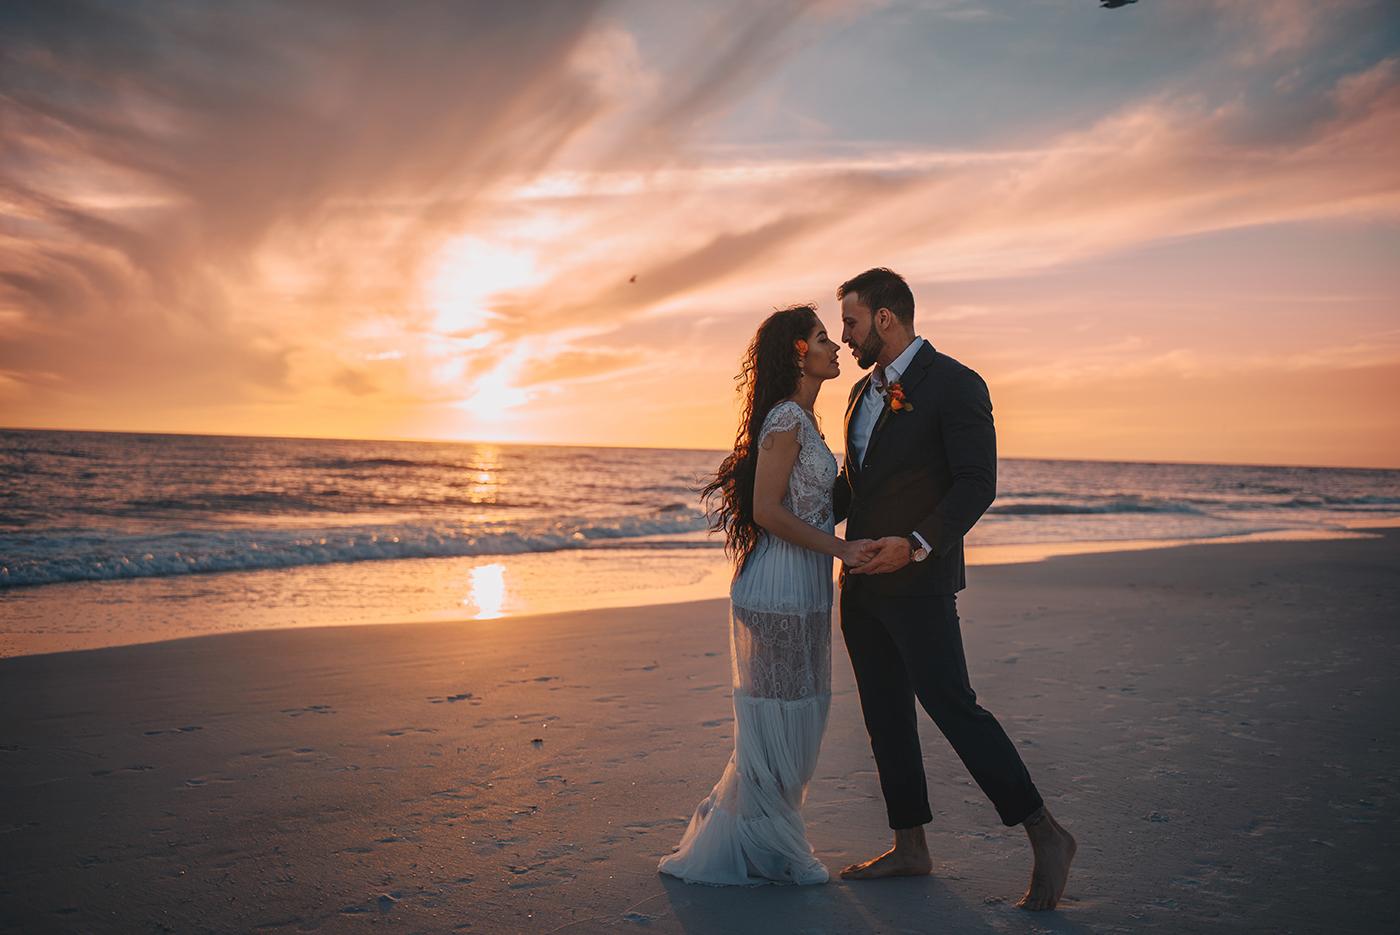 Los-Vargas-Photo-Moana-Wedding-Style-shoot-123.jpg